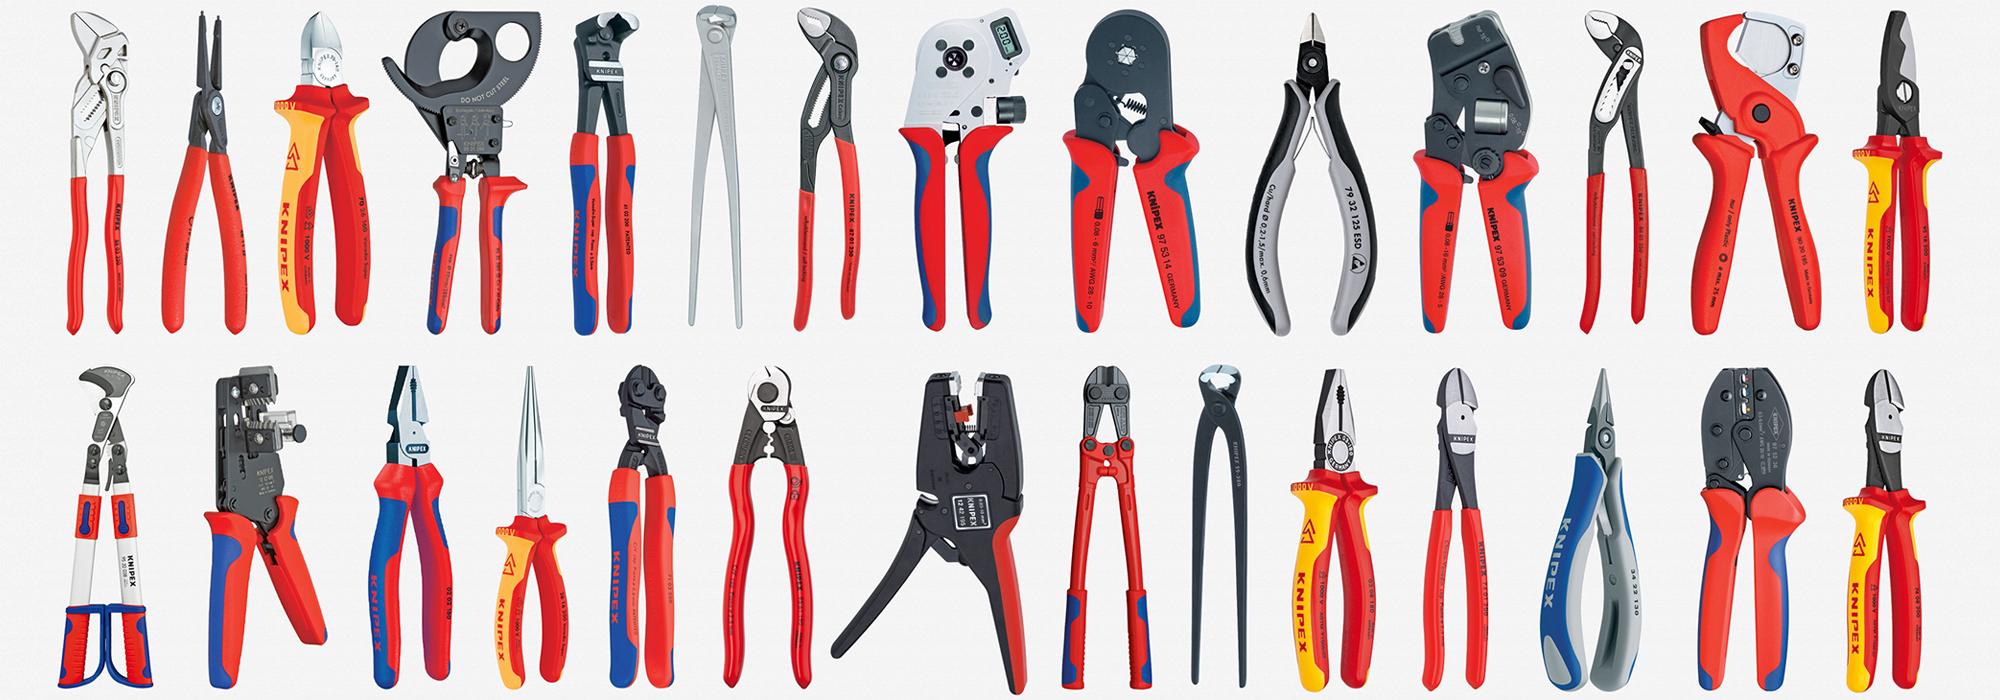 knipex tools knipex pliers kc tool